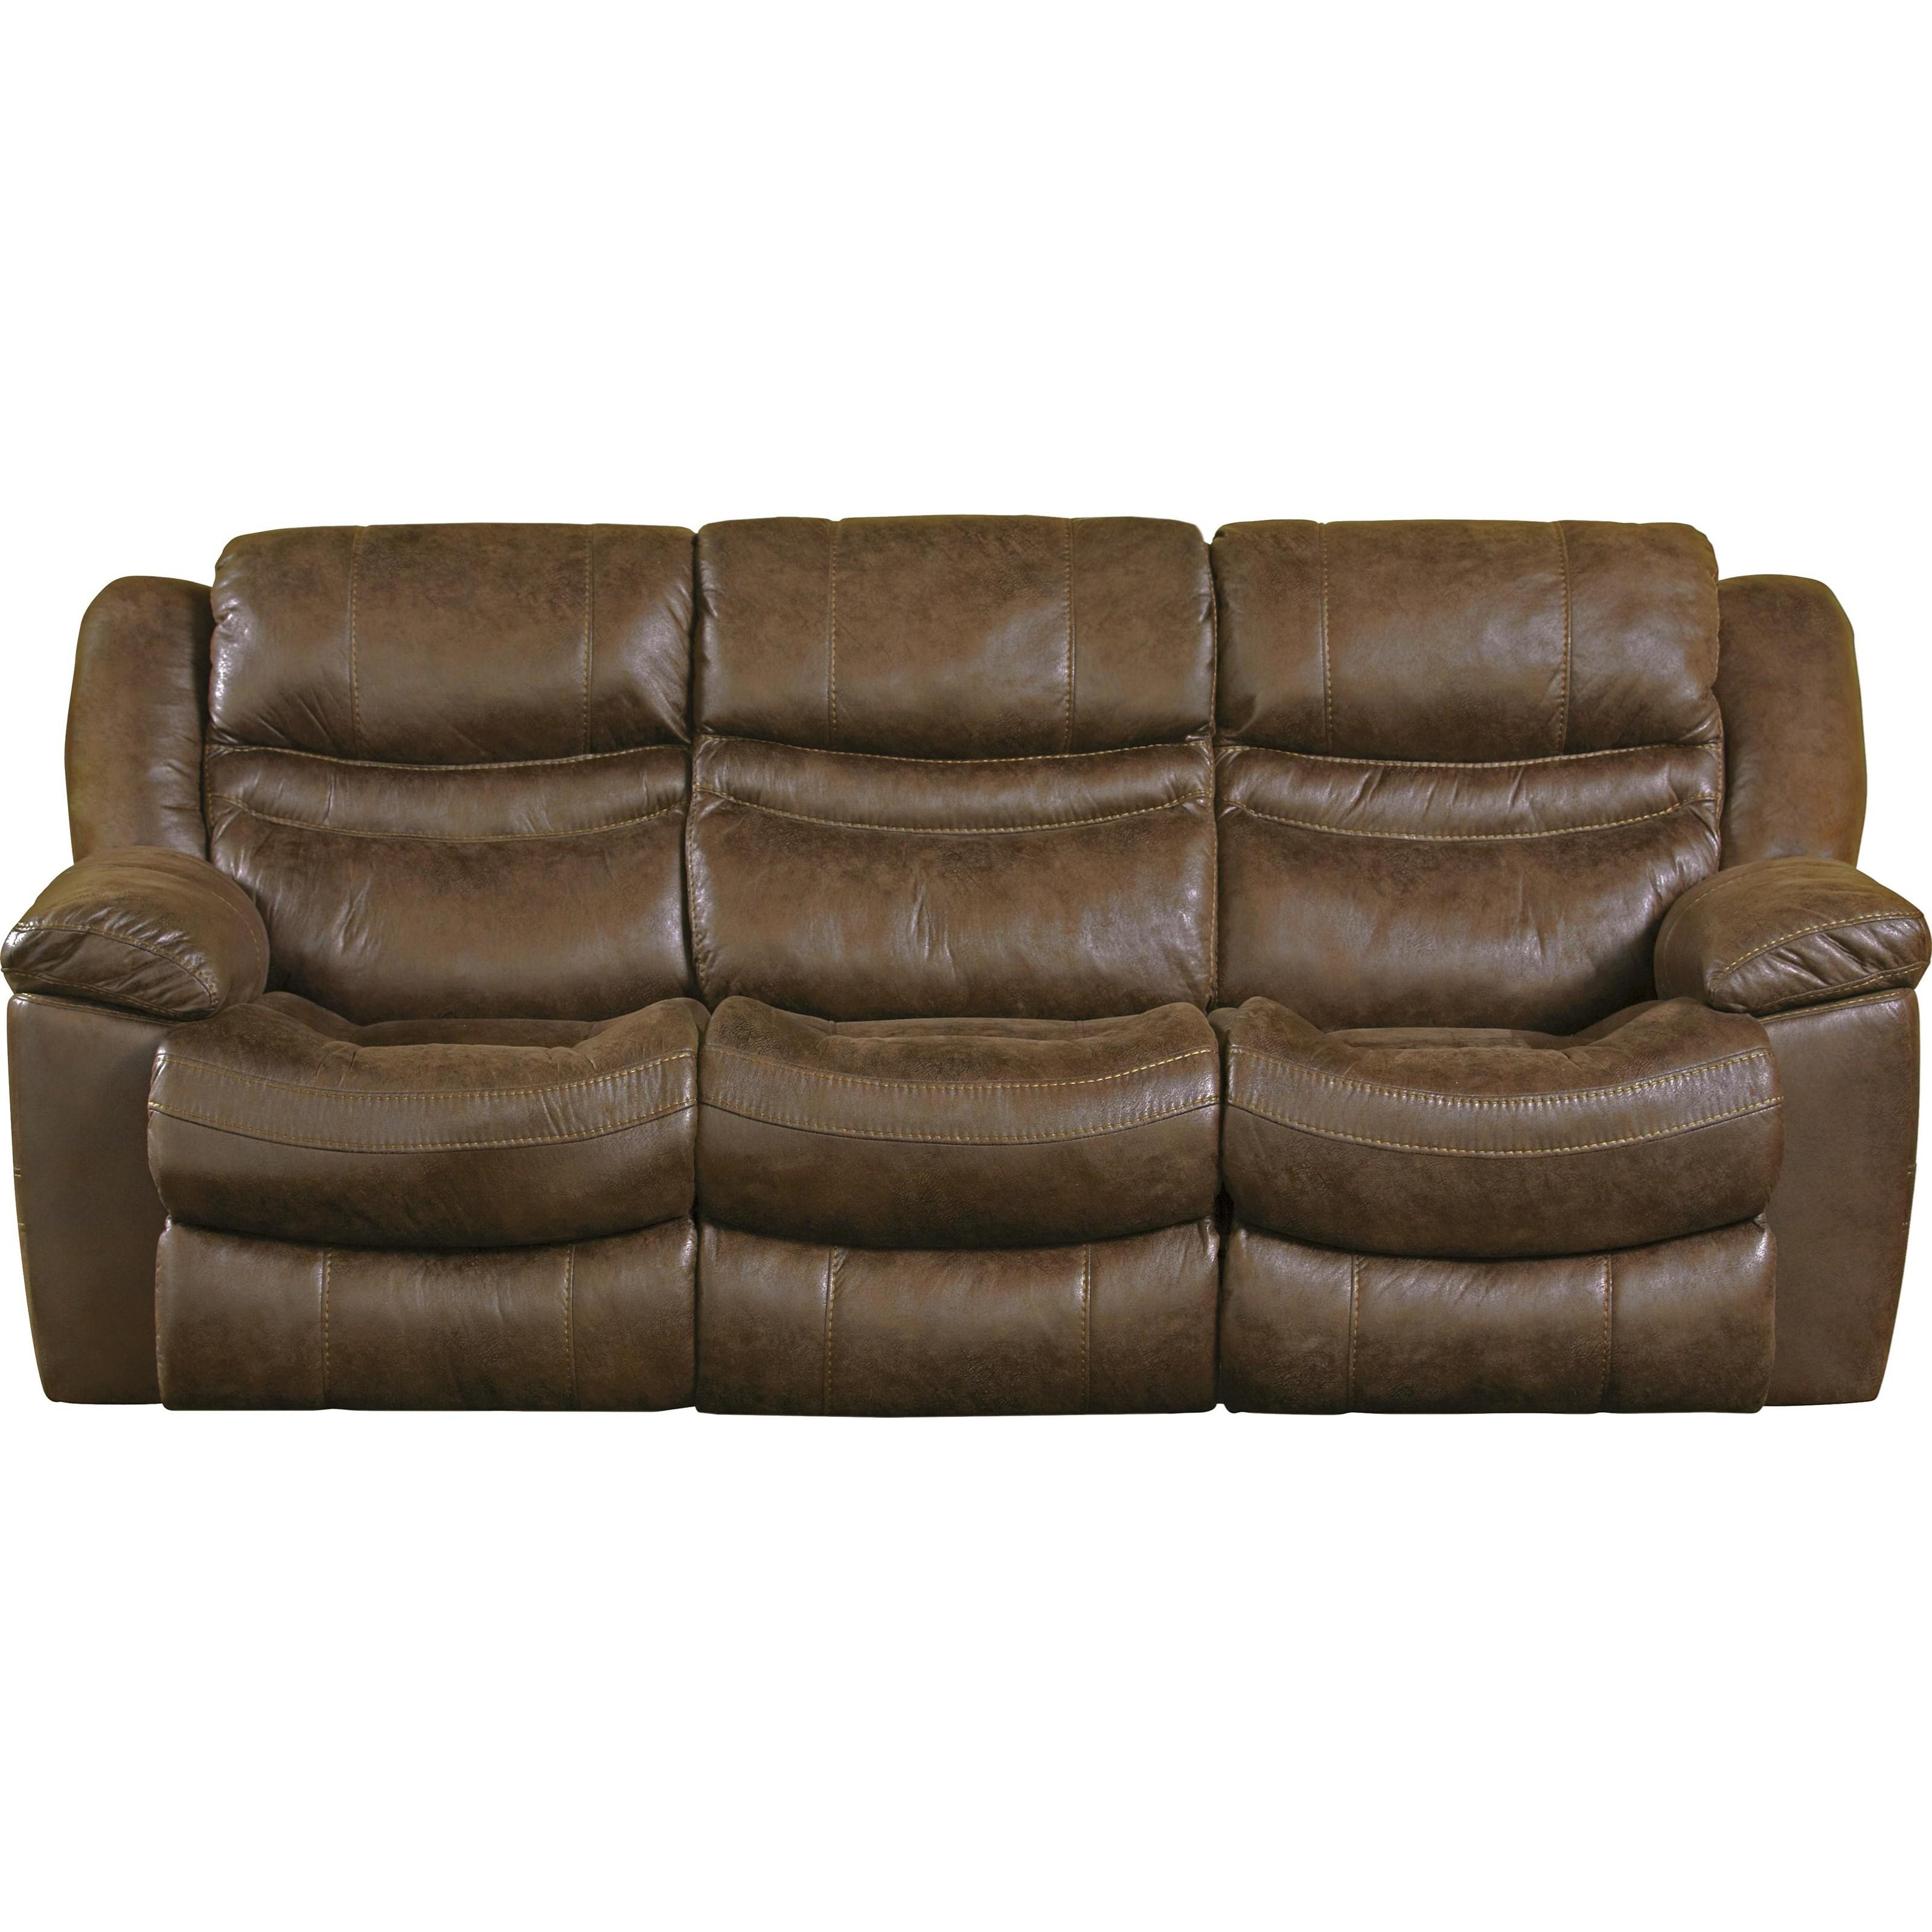 Perfect Catnapper ValiantReclining Sofa; Catnapper ValiantReclining Sofa